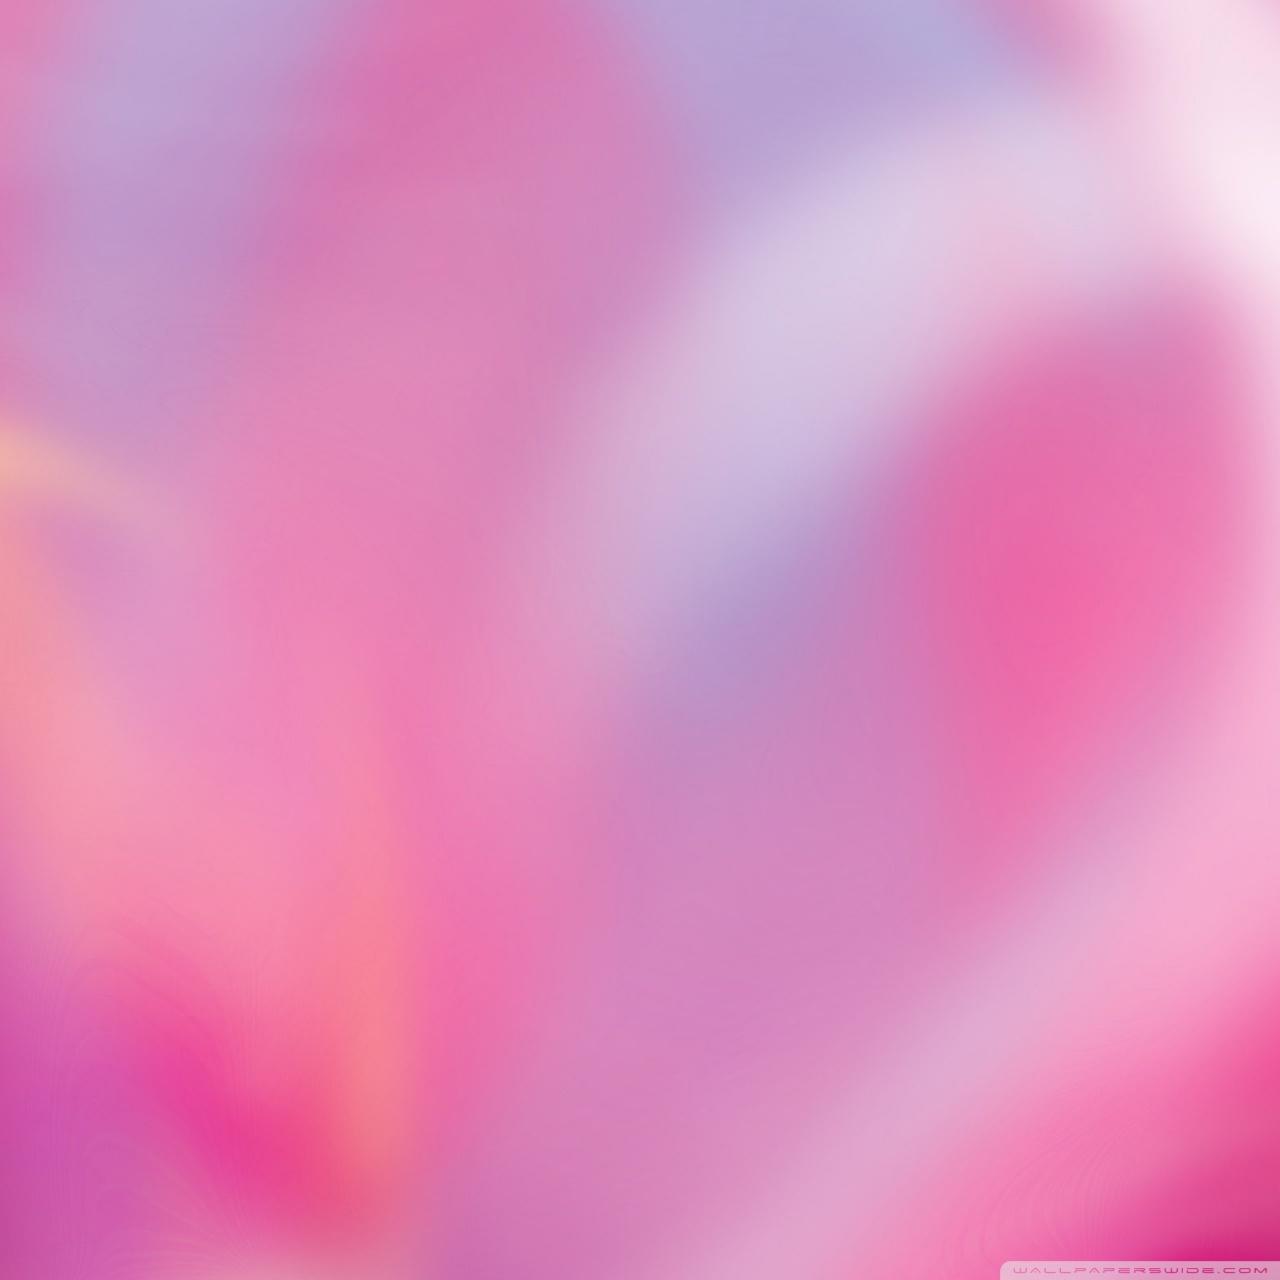 Colorful Aurora Pink Ultra Hd Desktop Background Wallpaper For 4k Uhd Tv Widescreen Ultrawide Desktop Laptop Tablet Smartphone